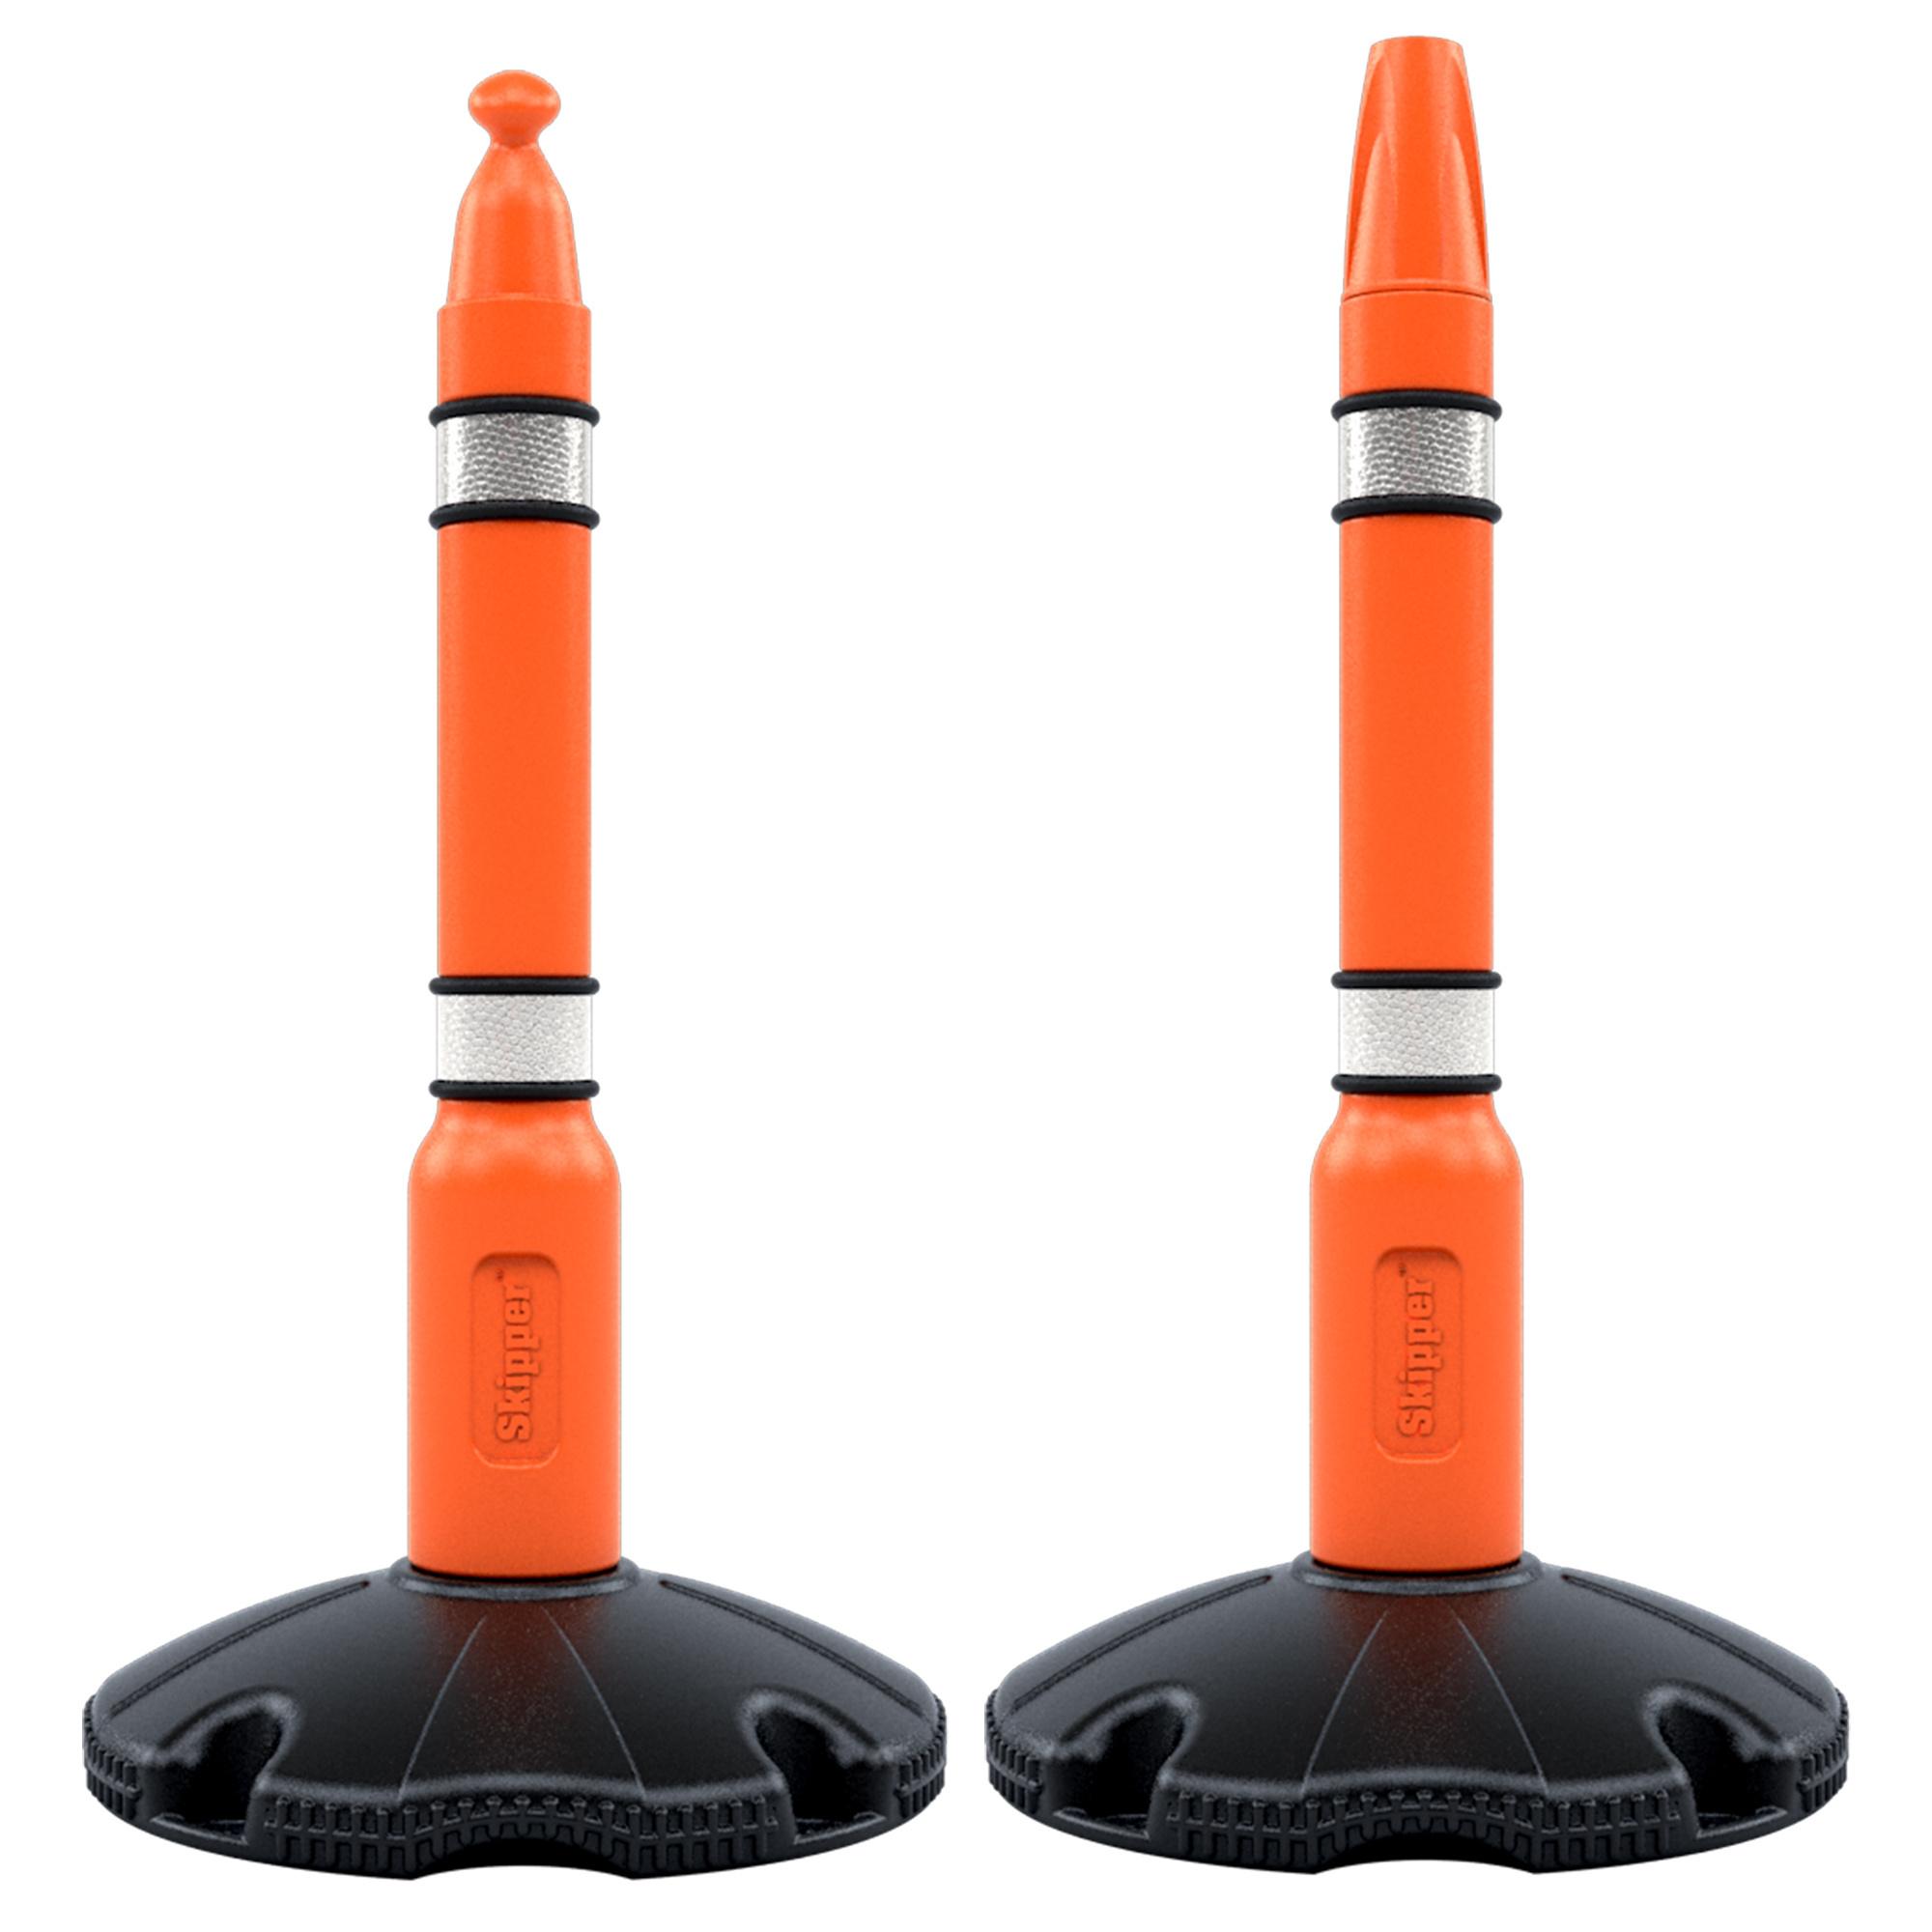 SKIPPER SKIPPER post cap - orange